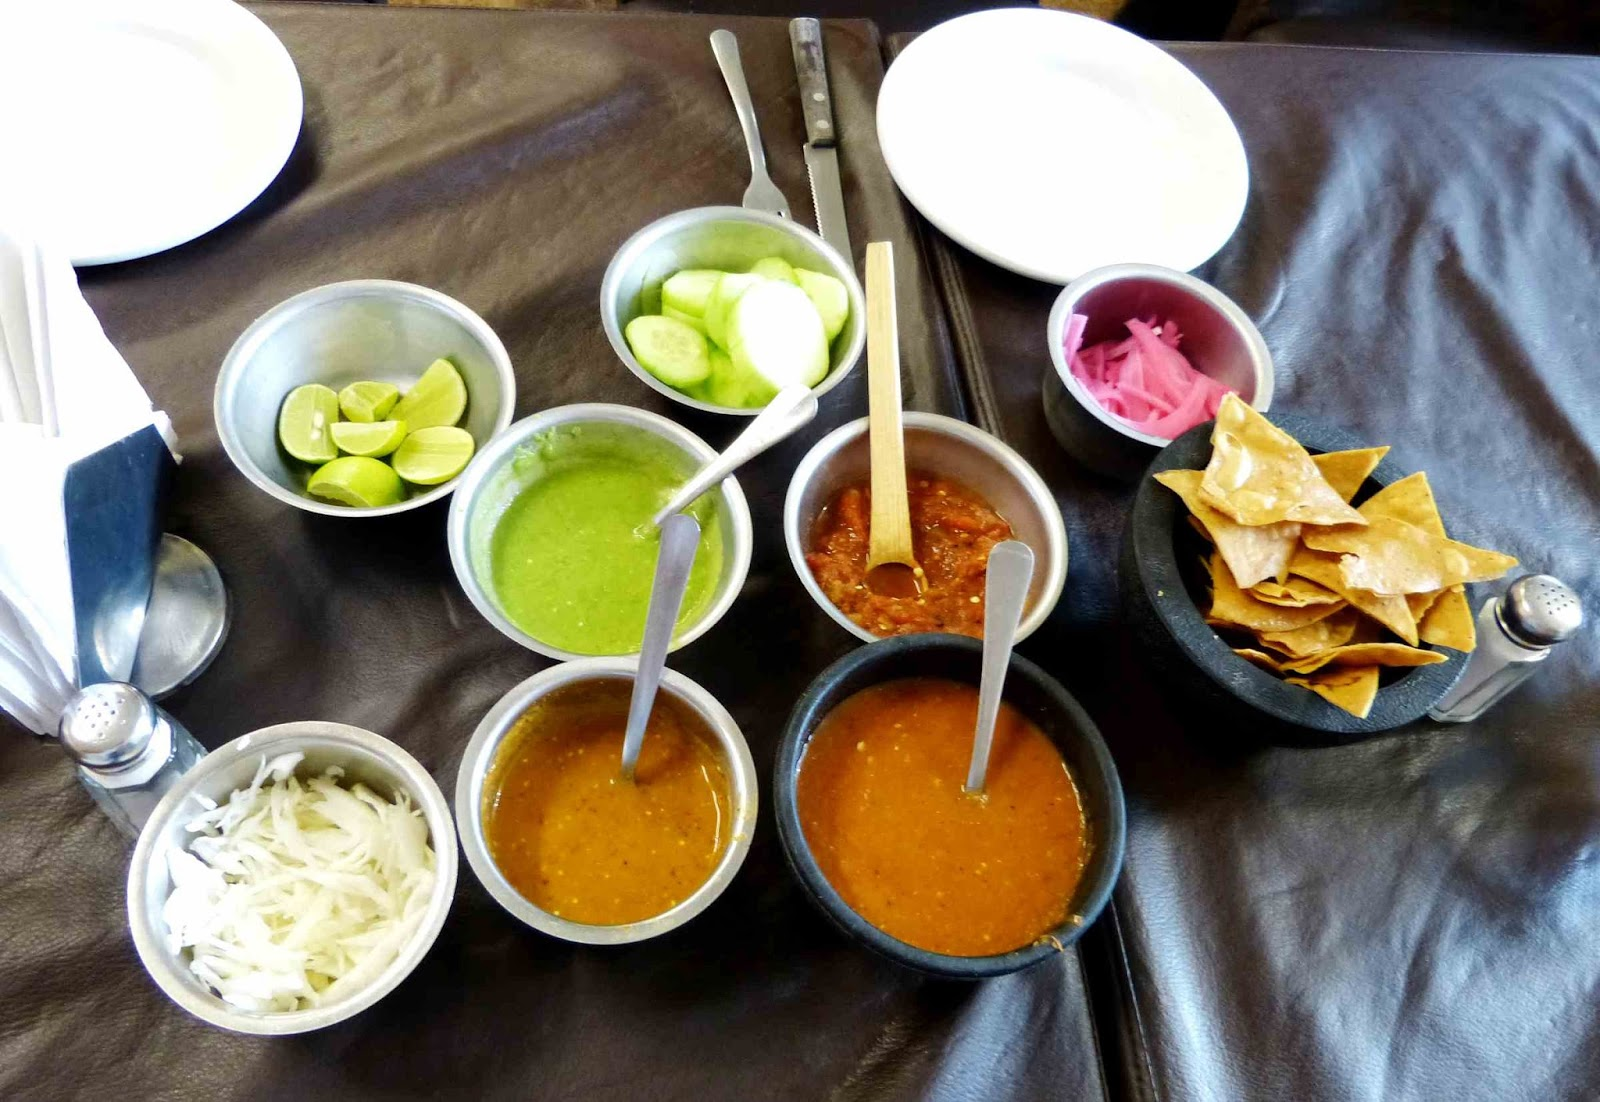 Distintos tipos de salsas en un restaurante